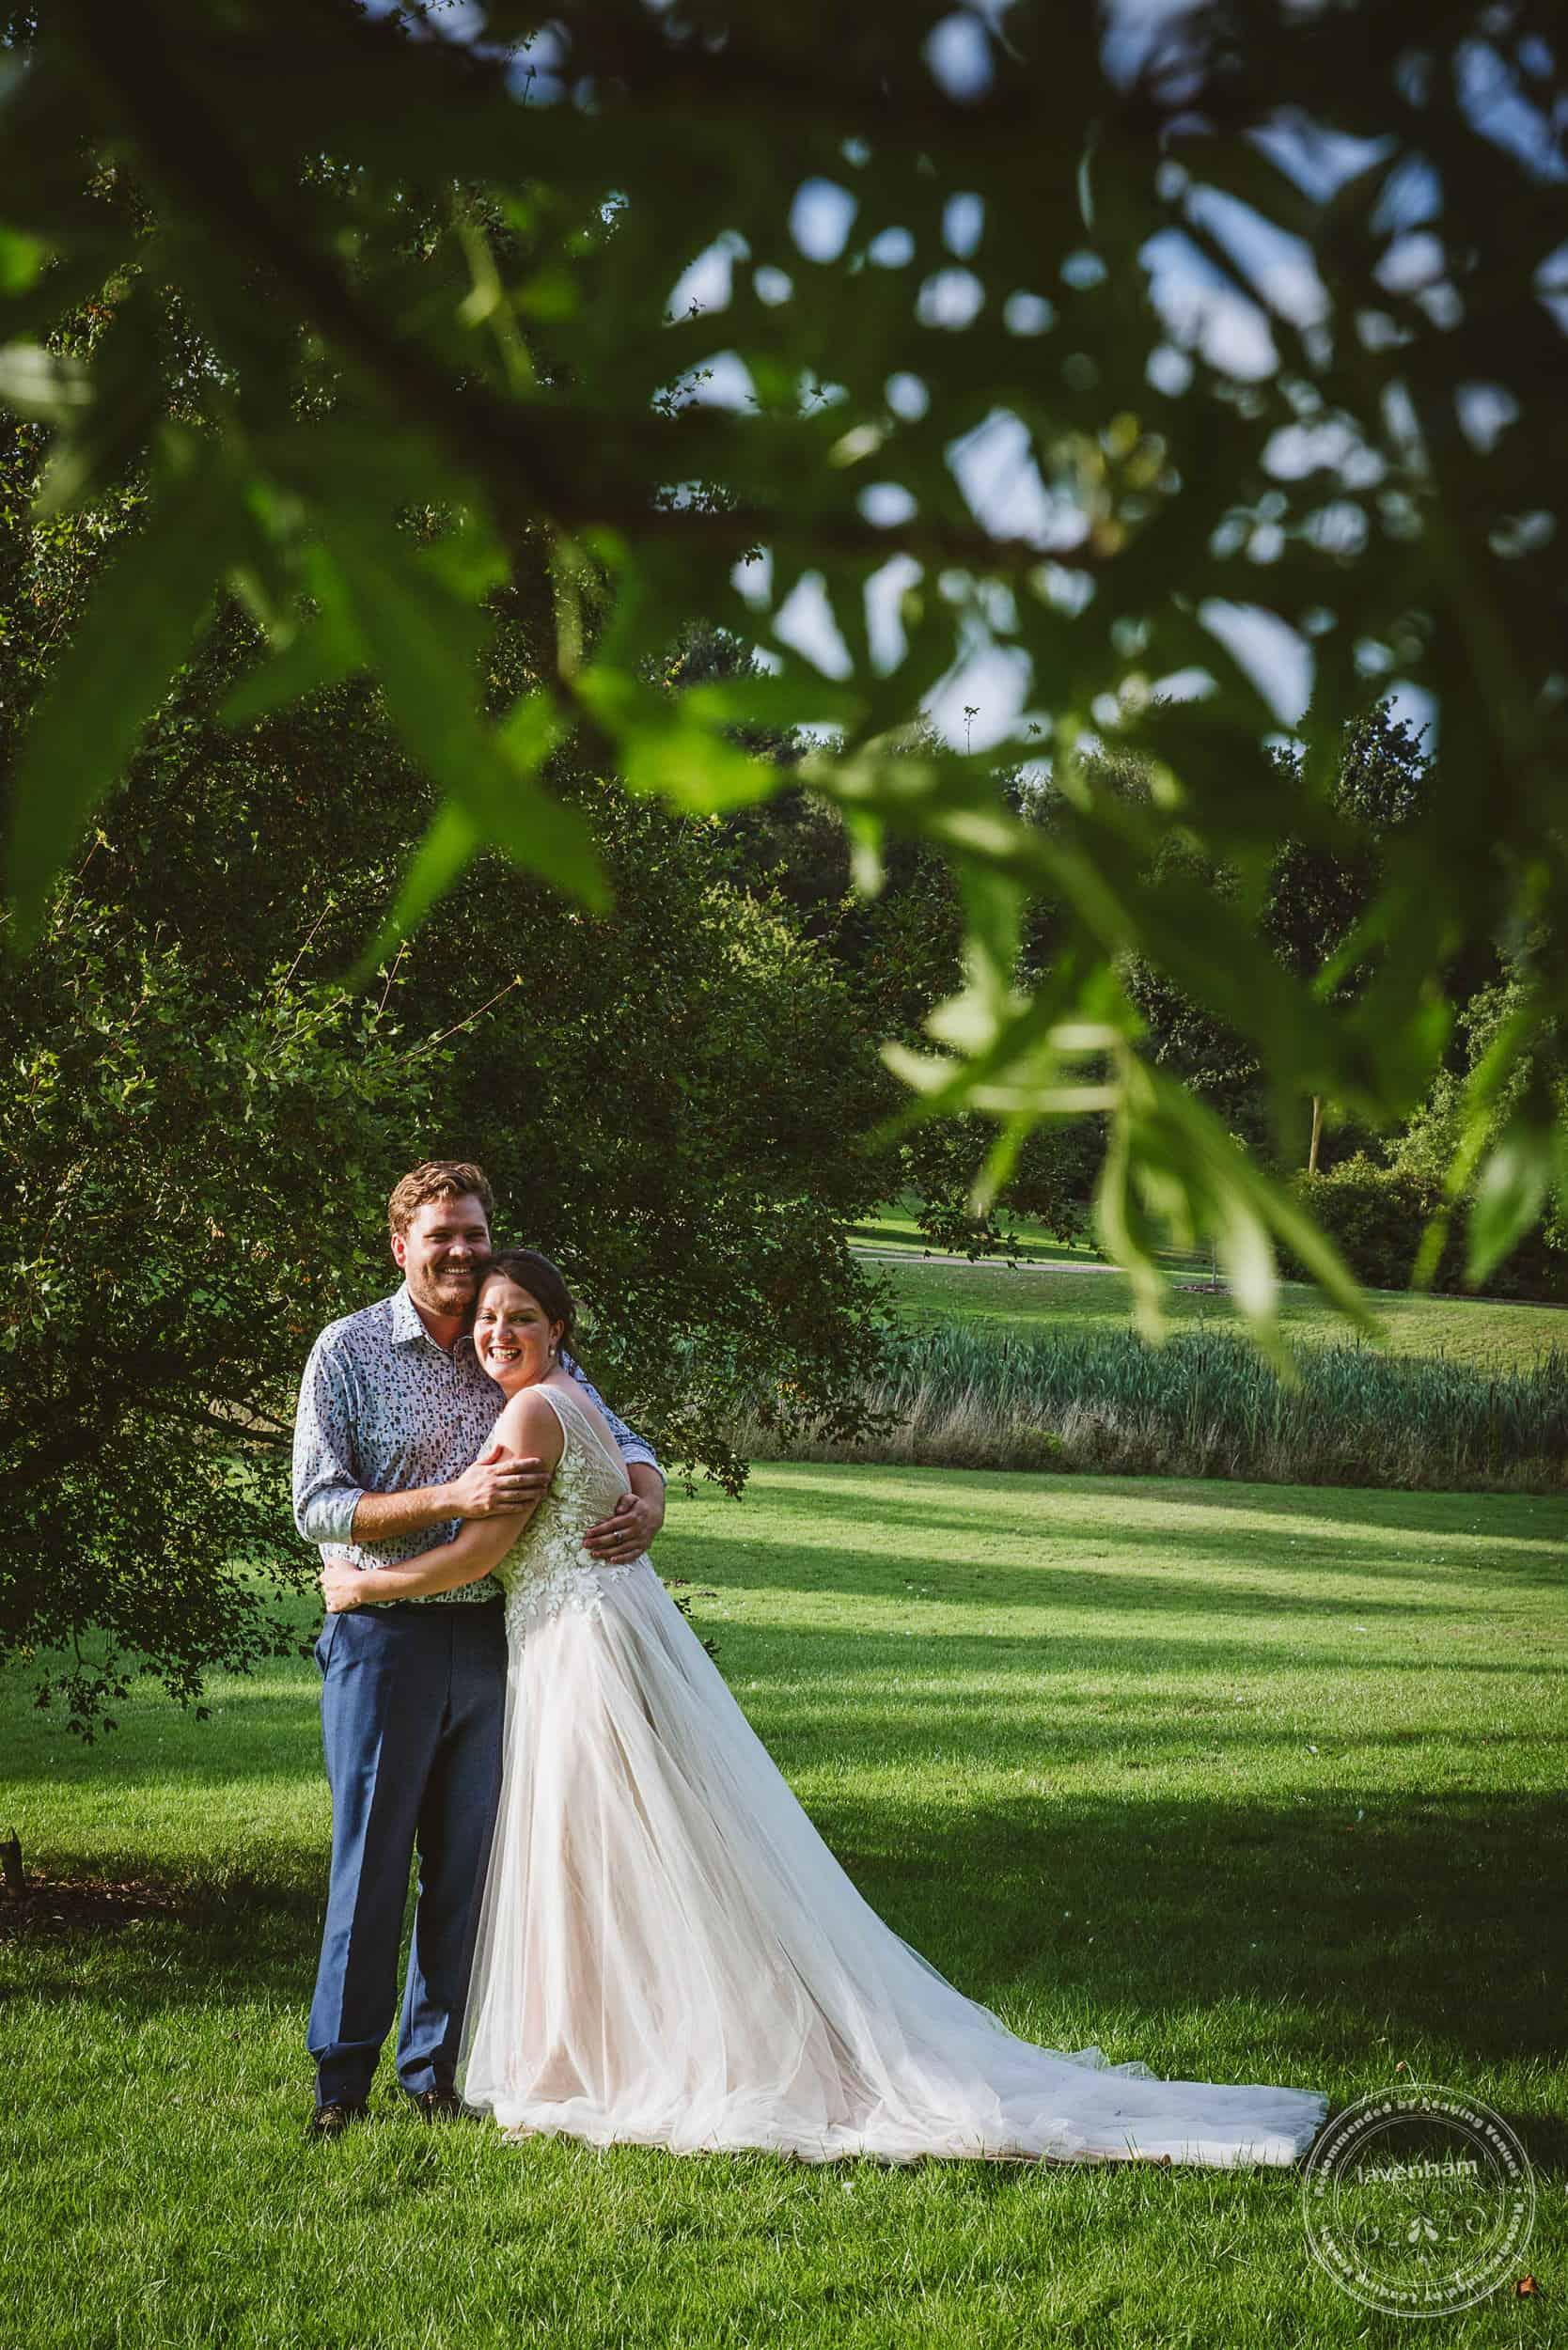 180818 Marks Hall Wedding Photography Lavenham Photographic 131